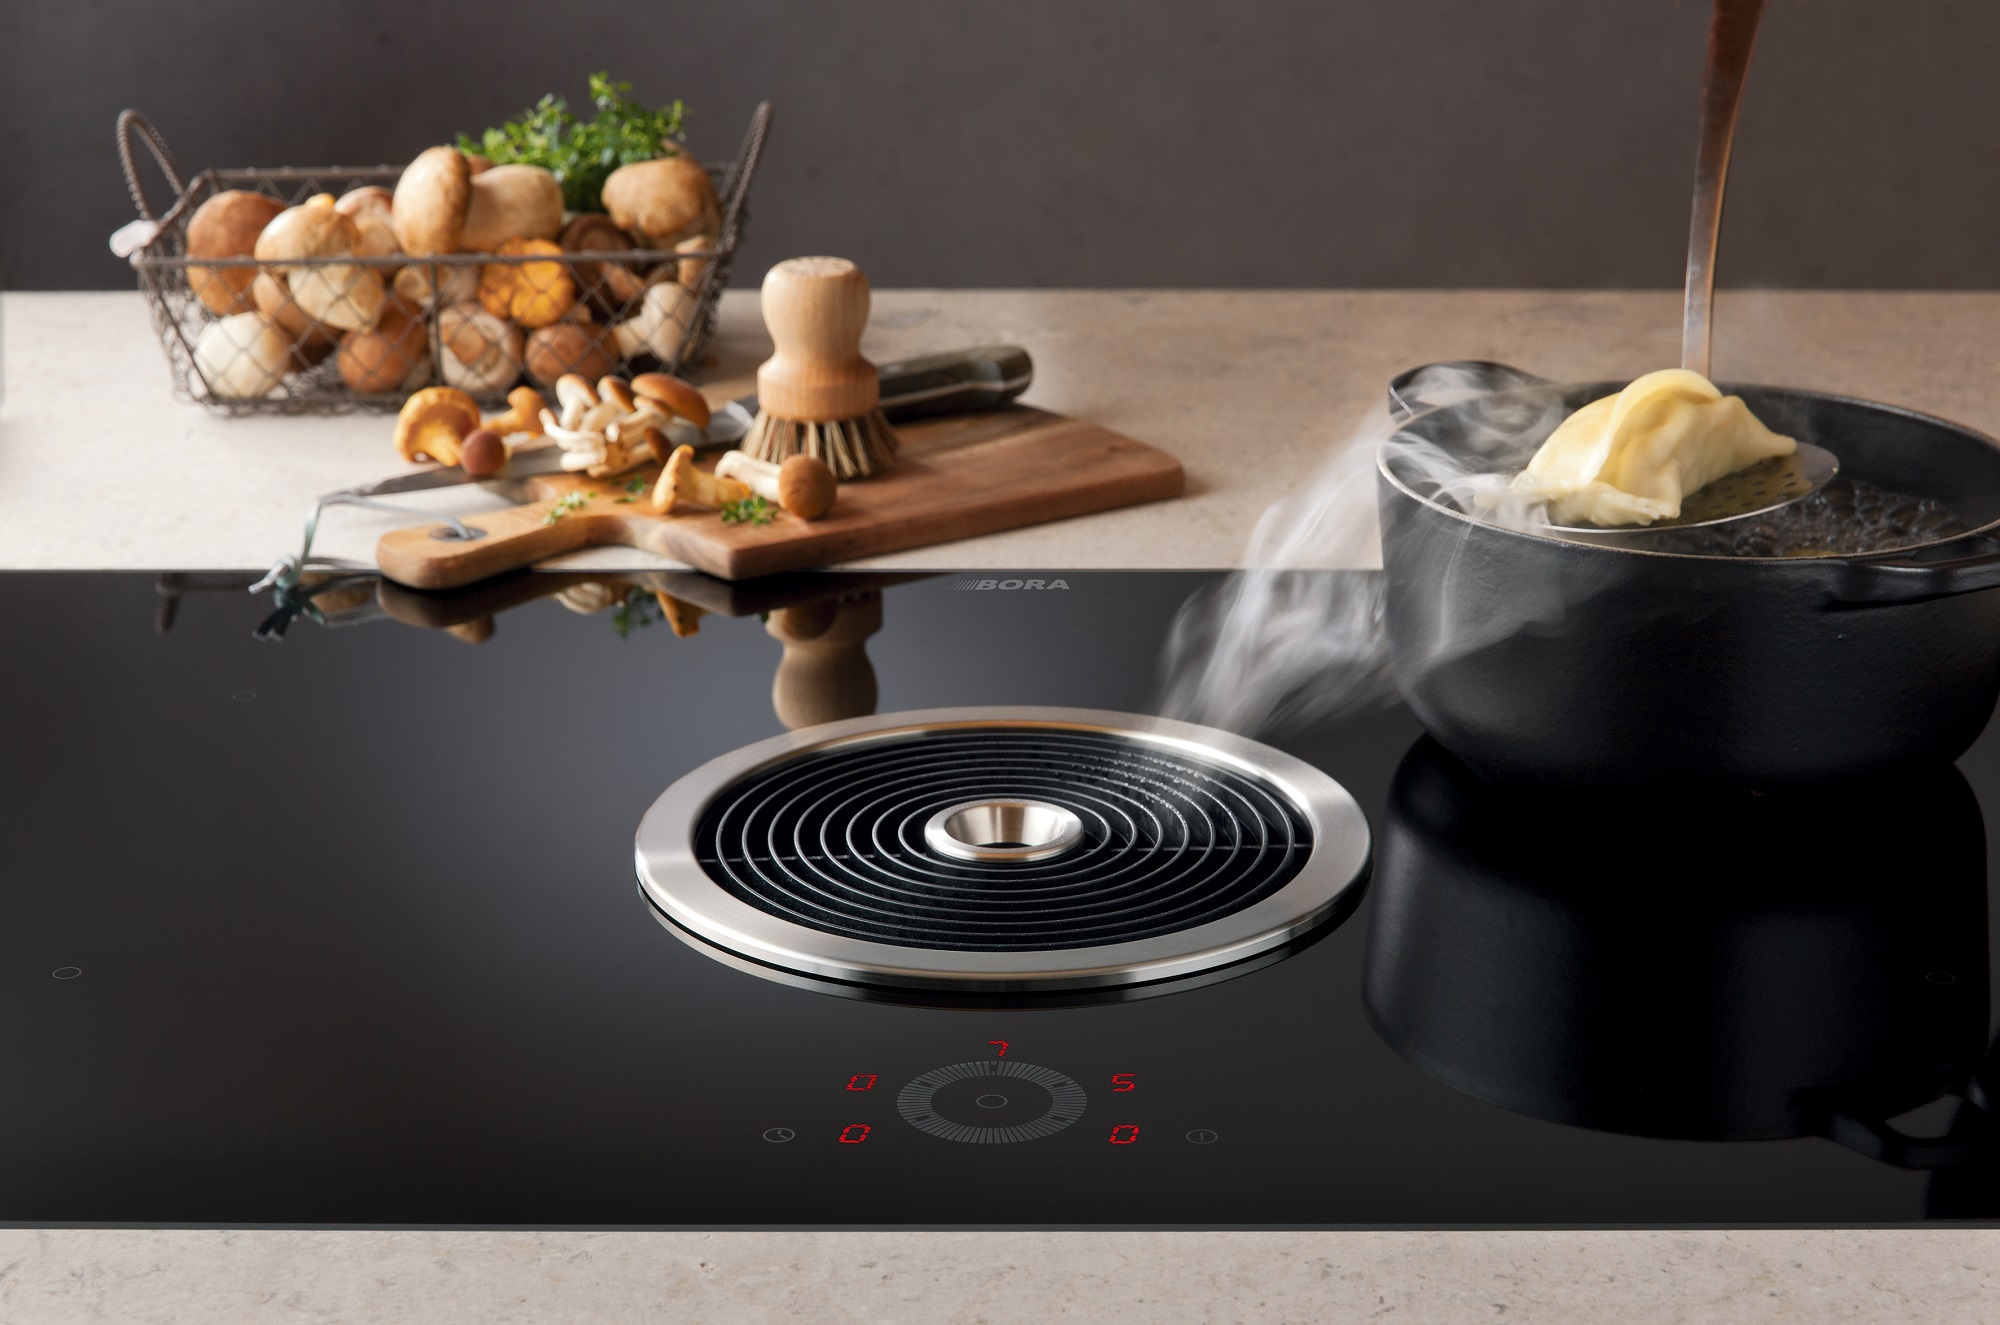 BORA Basic: Kochfeld und Kochfeldabzug als kompaktes System für jede ...